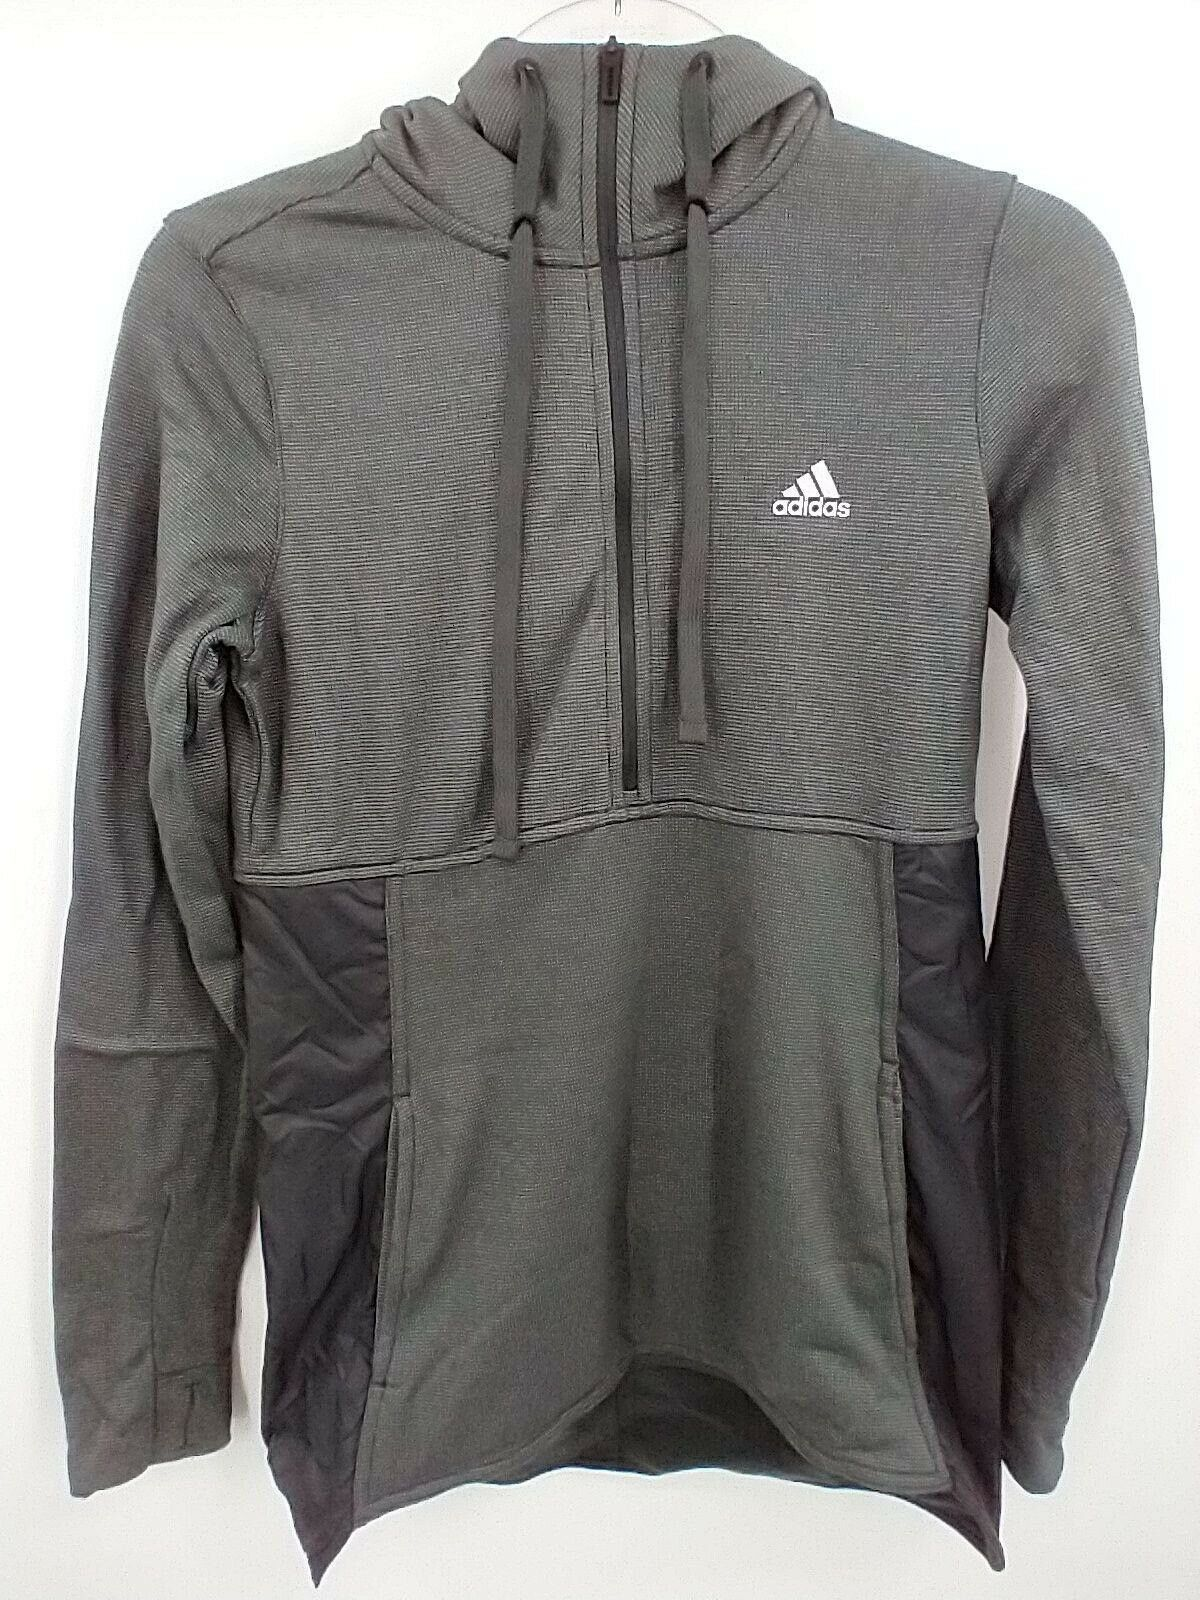 Adidas Women's Climawarm Hoodie Small Black BP6920 NEW